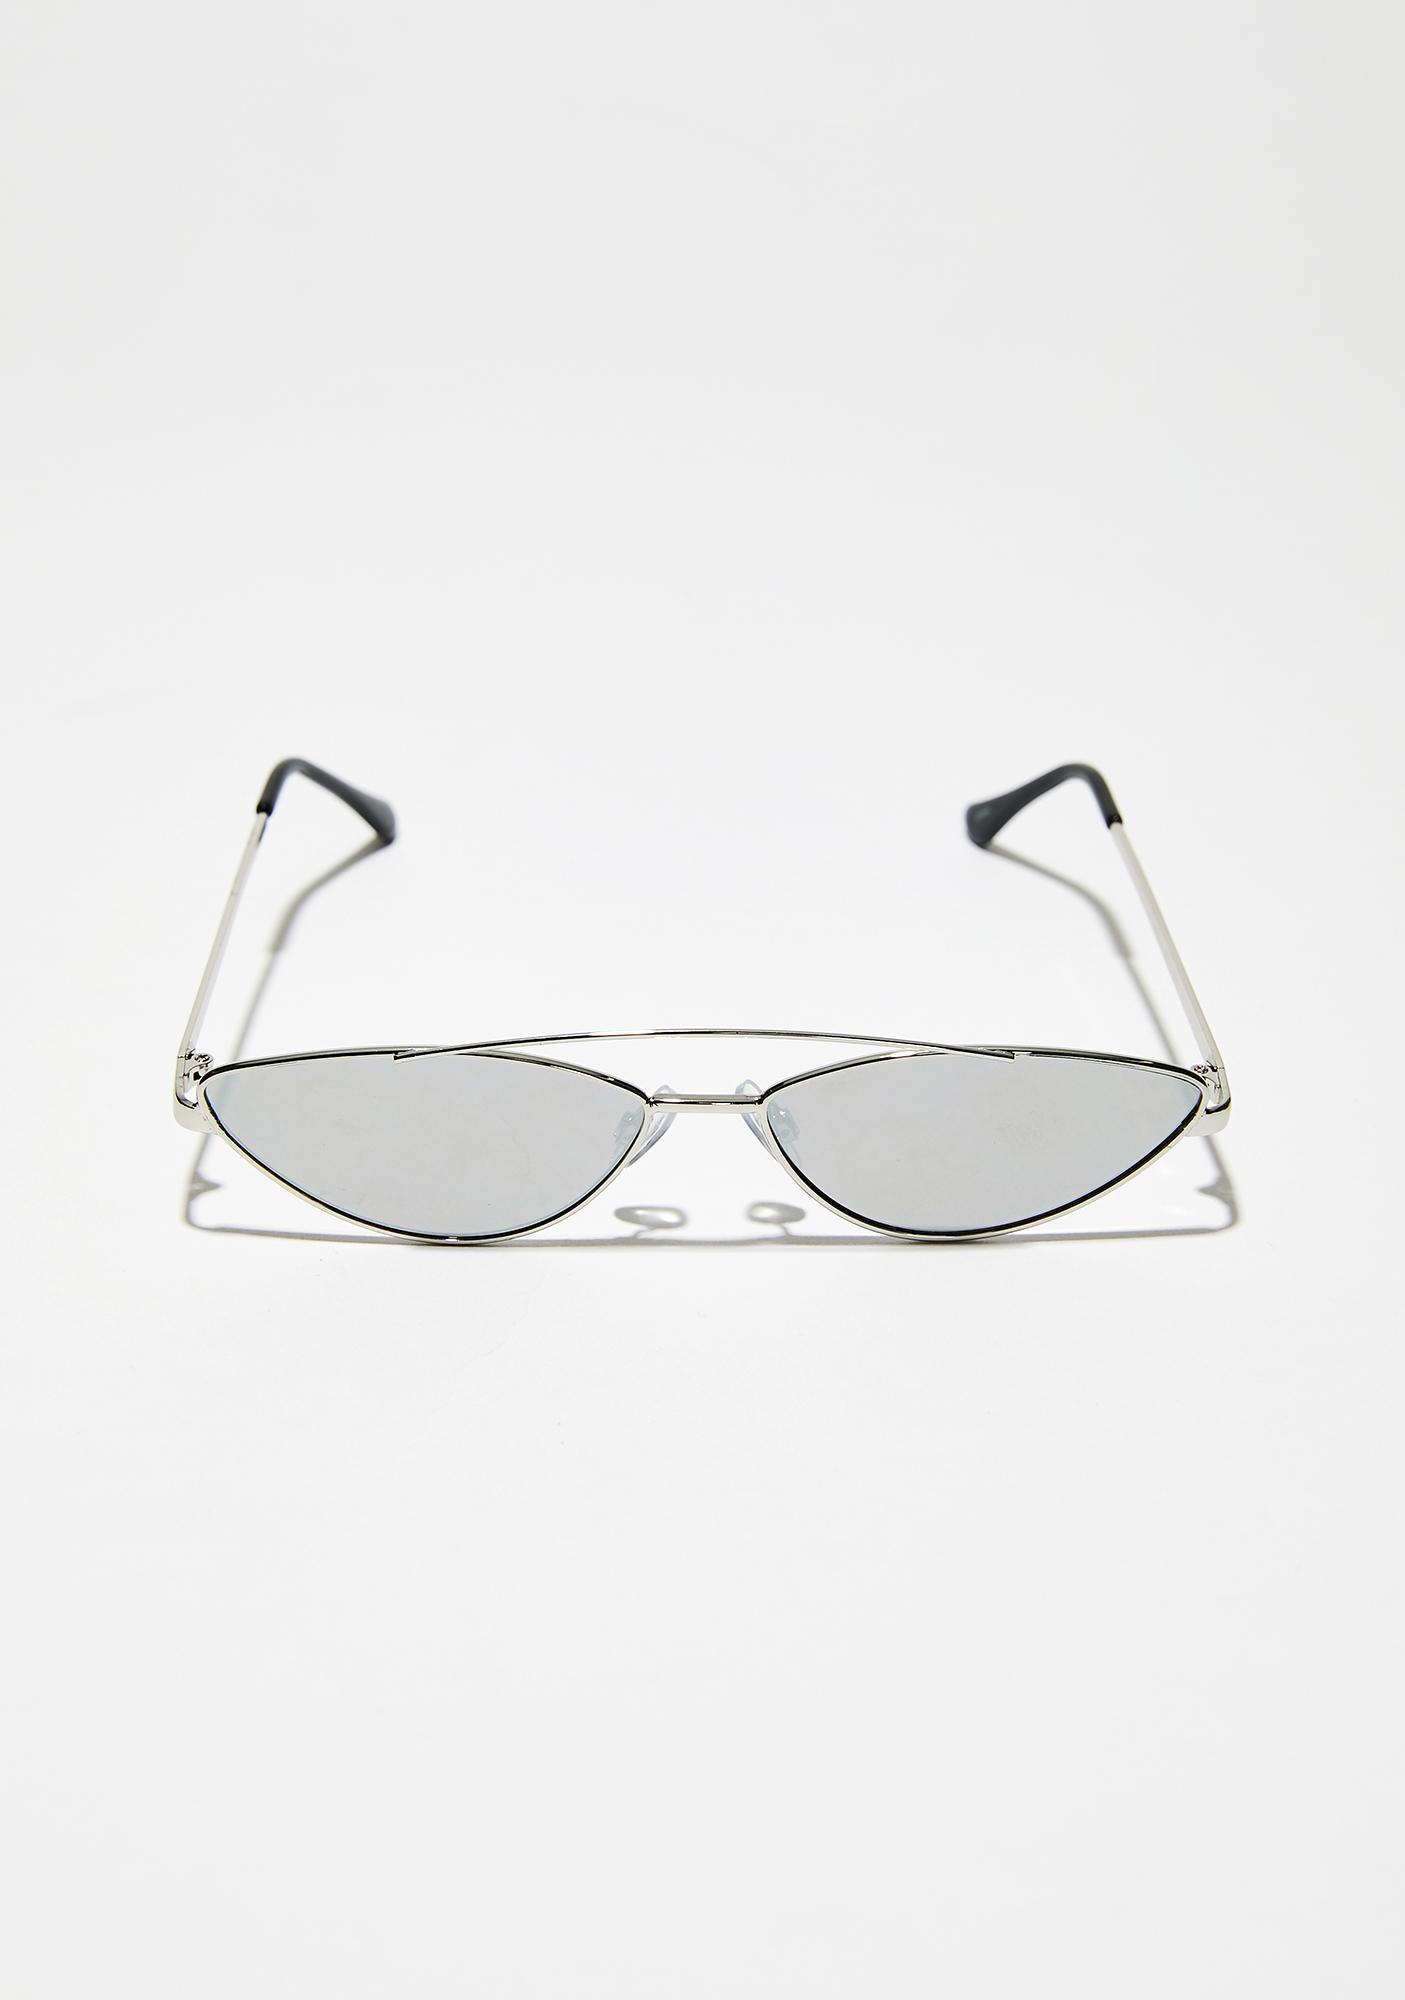 Stackin' Up Skinny Sunglasses